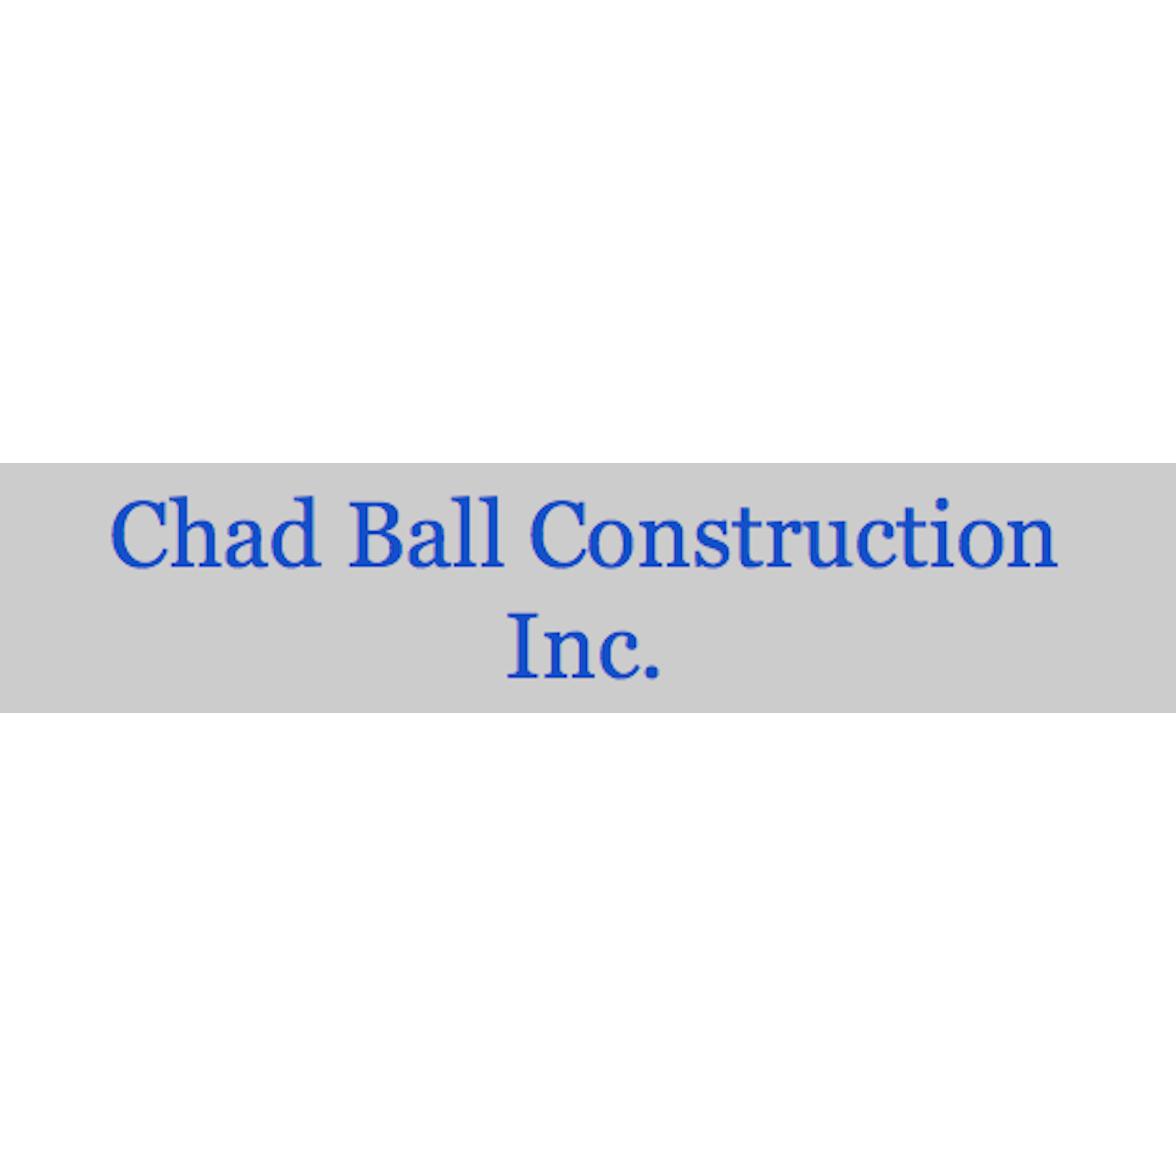 Chad Ball Construction Inc.